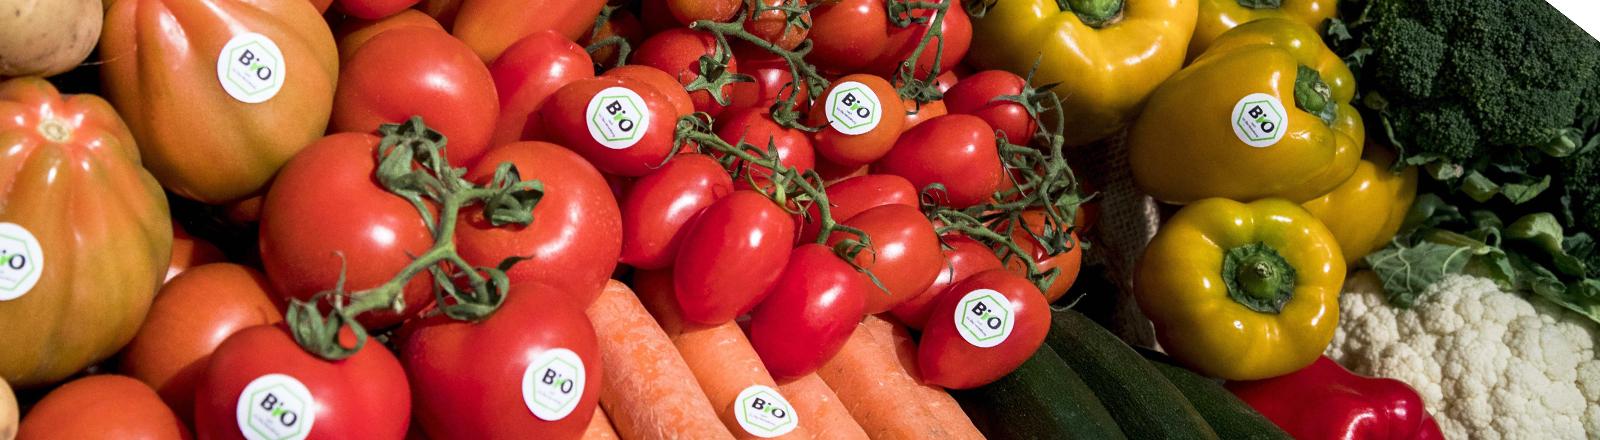 Biogemüse mit Tomaten, Paprika, Karotten, Zucchini.